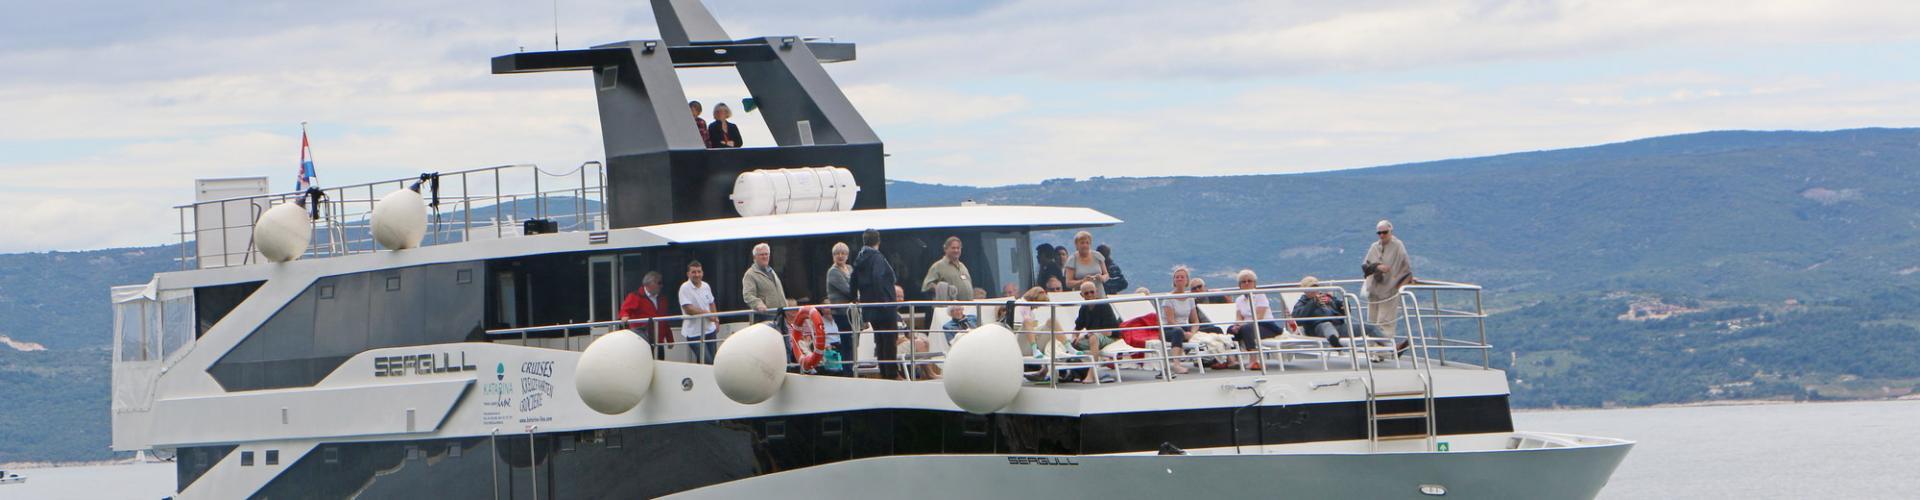 Premium Superior cruiser MV Seagull- motor yacht